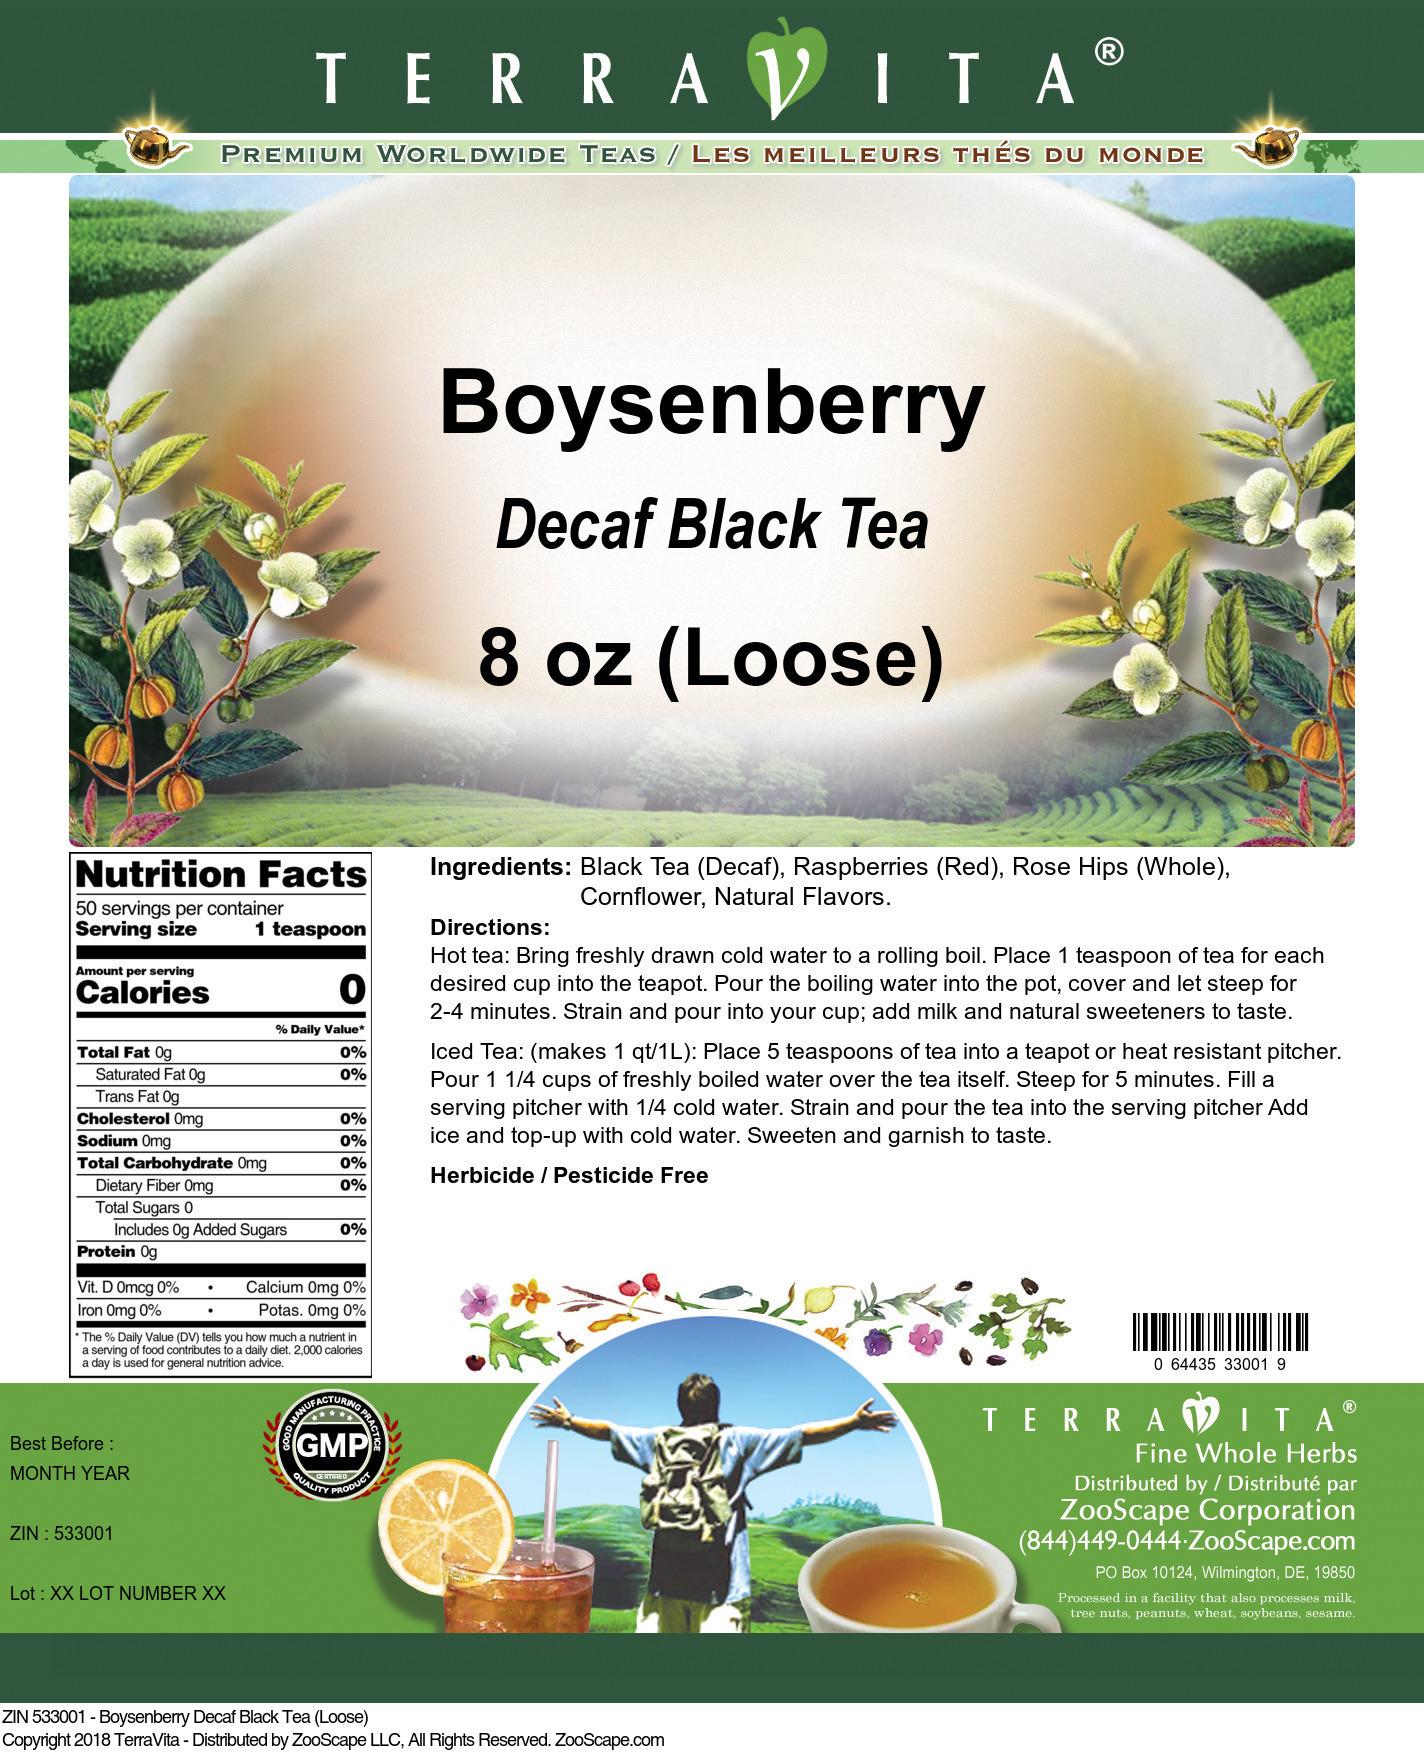 Boysenberry Decaf Black Tea (Loose)